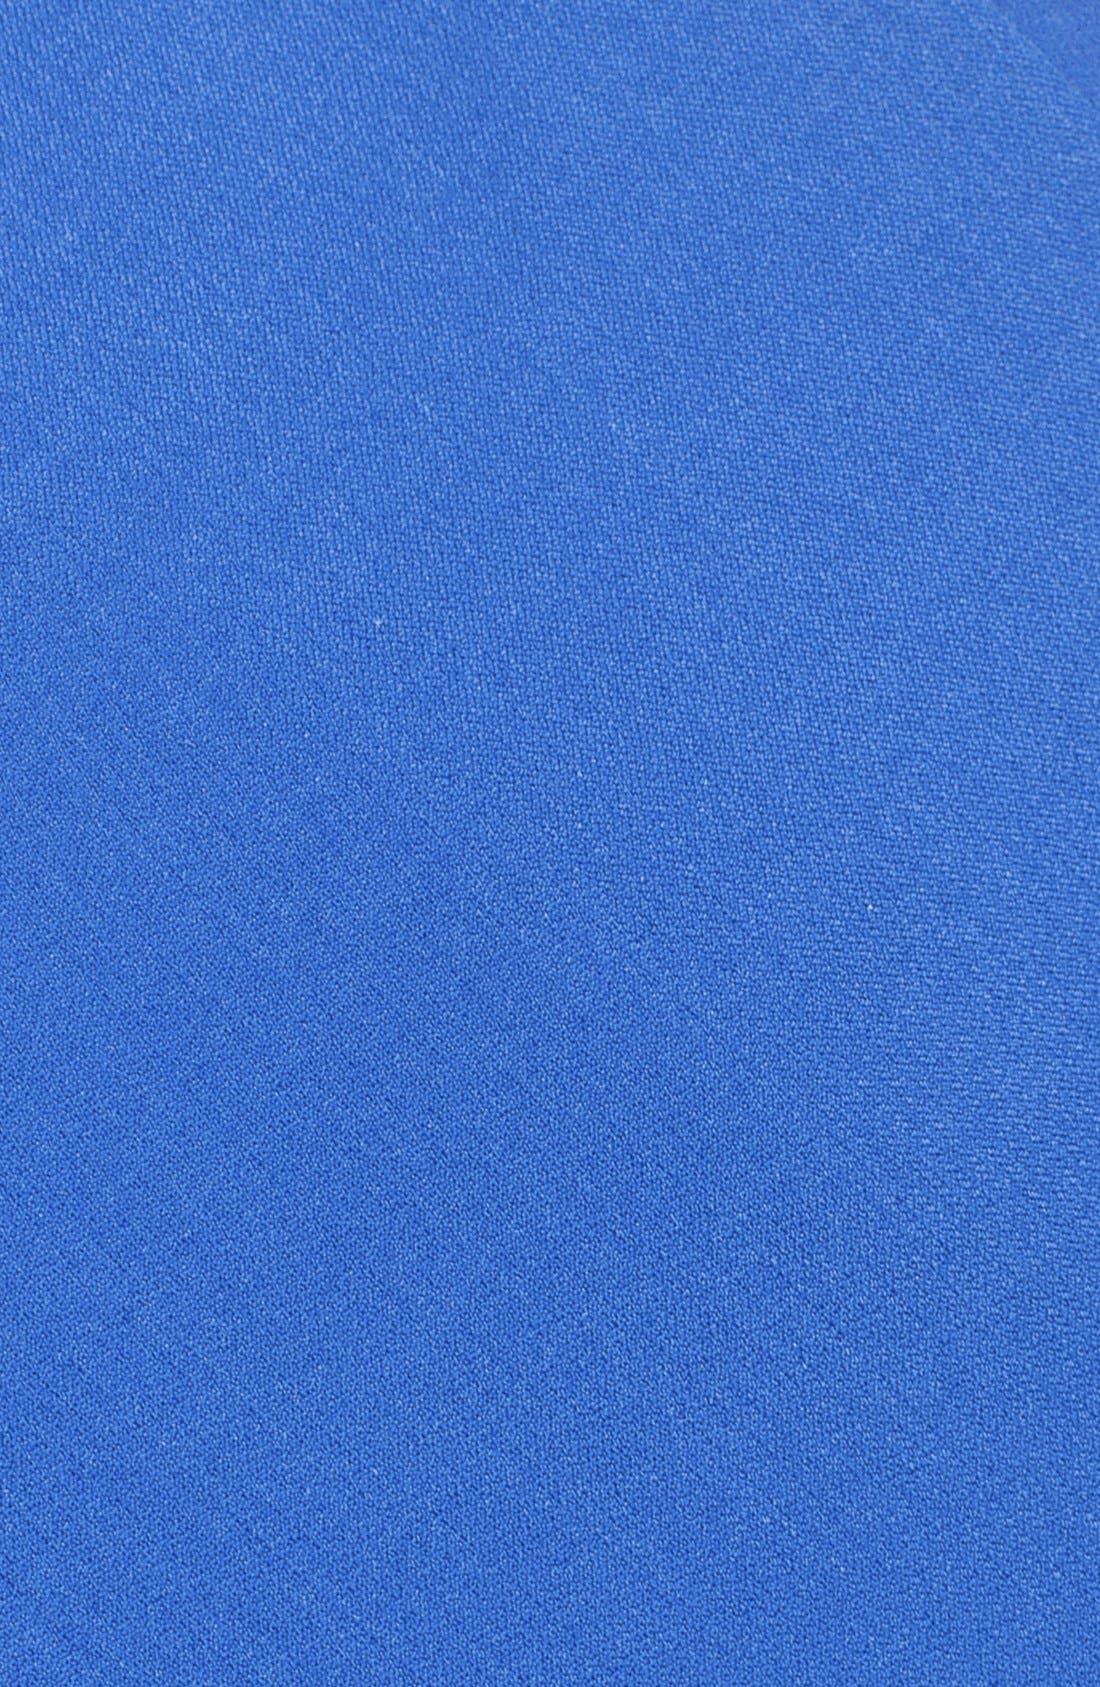 Ruched Matte Stretch Crepe Sheath Dress,                             Alternate thumbnail 2, color,                             433